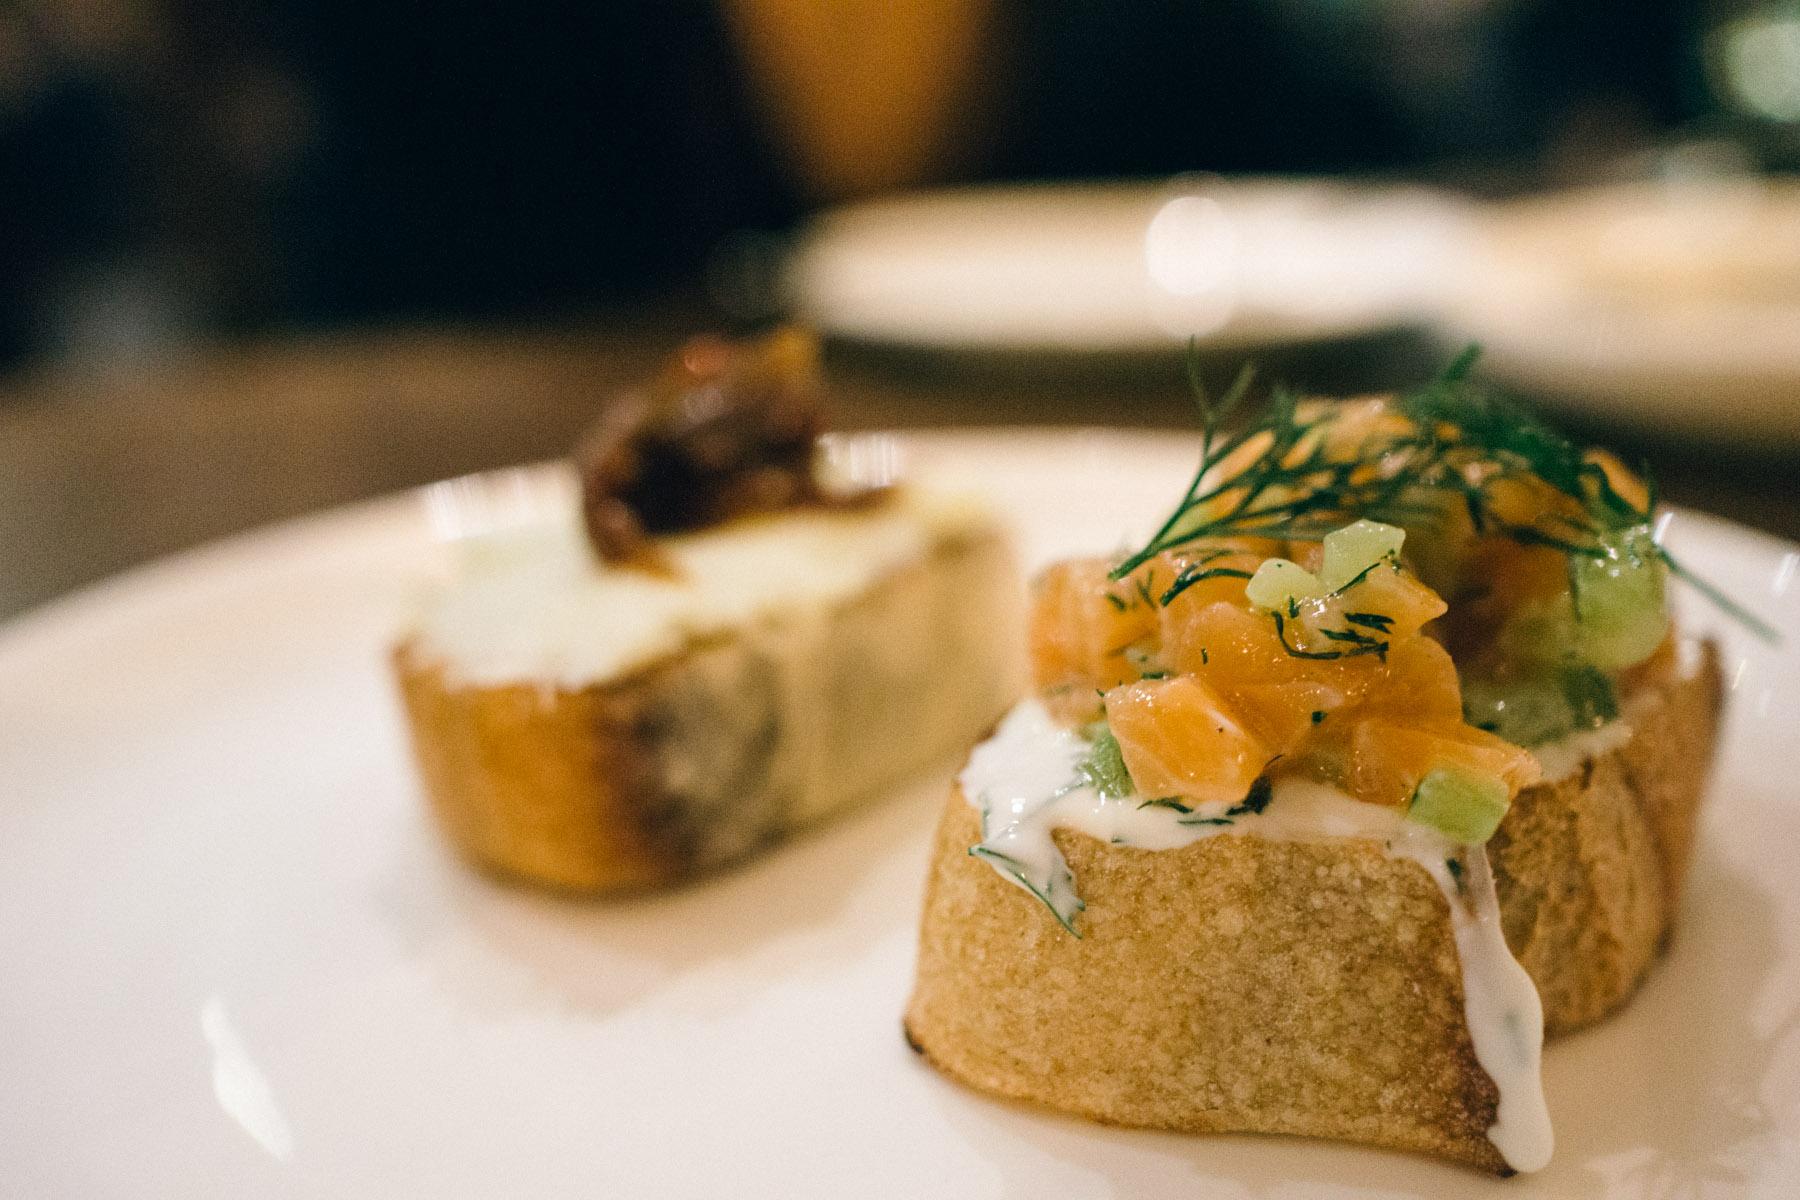 ham-and-sherry-spanish-tapas-ship-street-wan-chai-hong-kong-jason-atherton-19